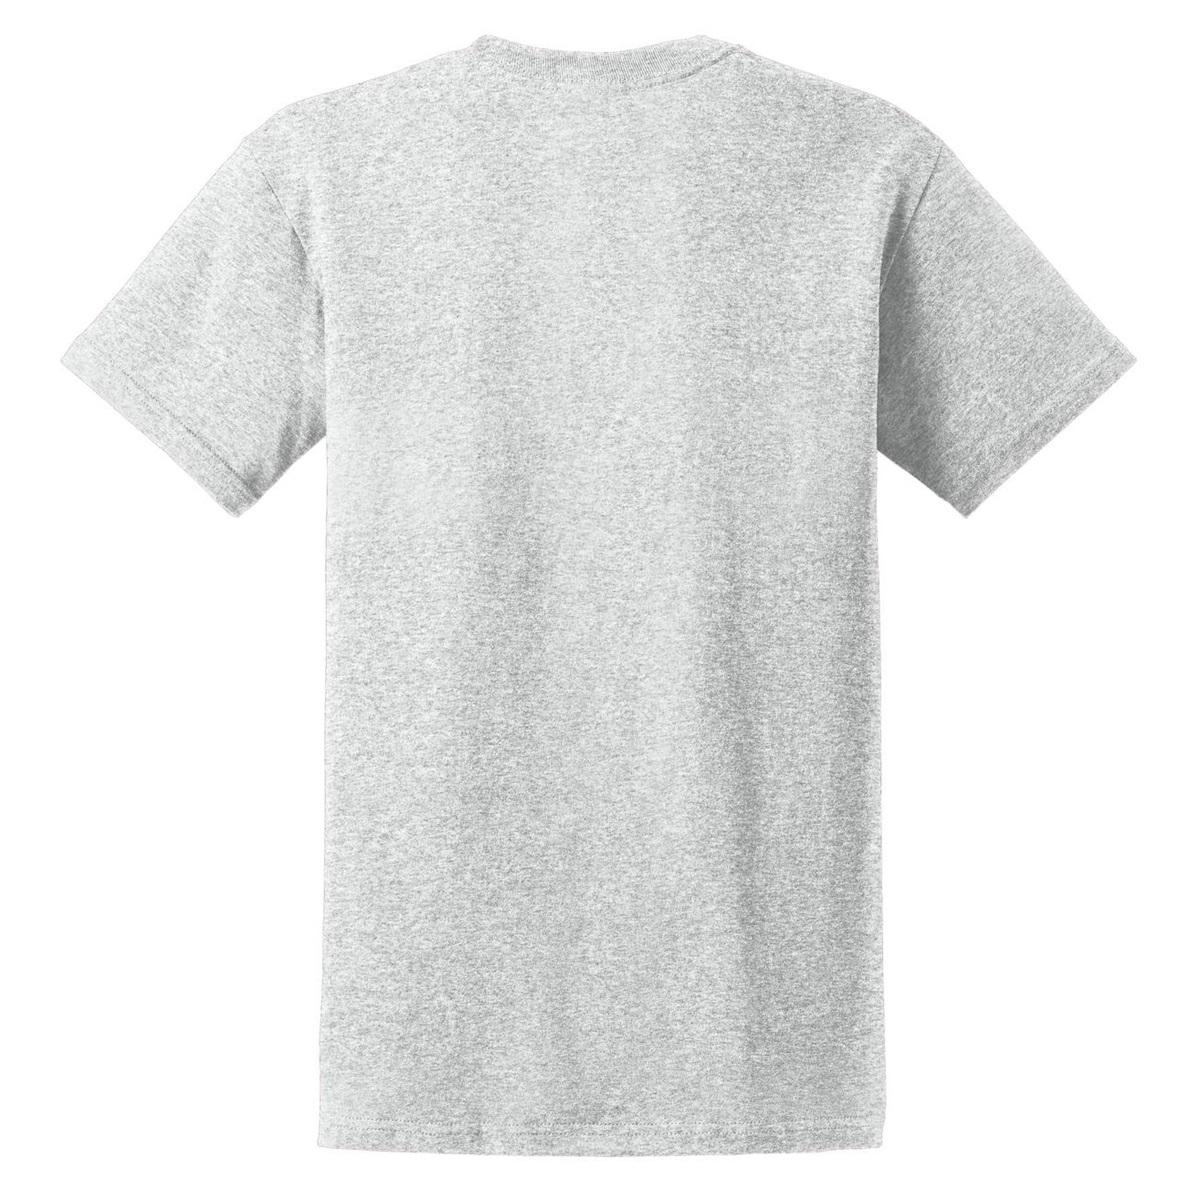 gildan 2000 ultra cotton t shirt ash grey